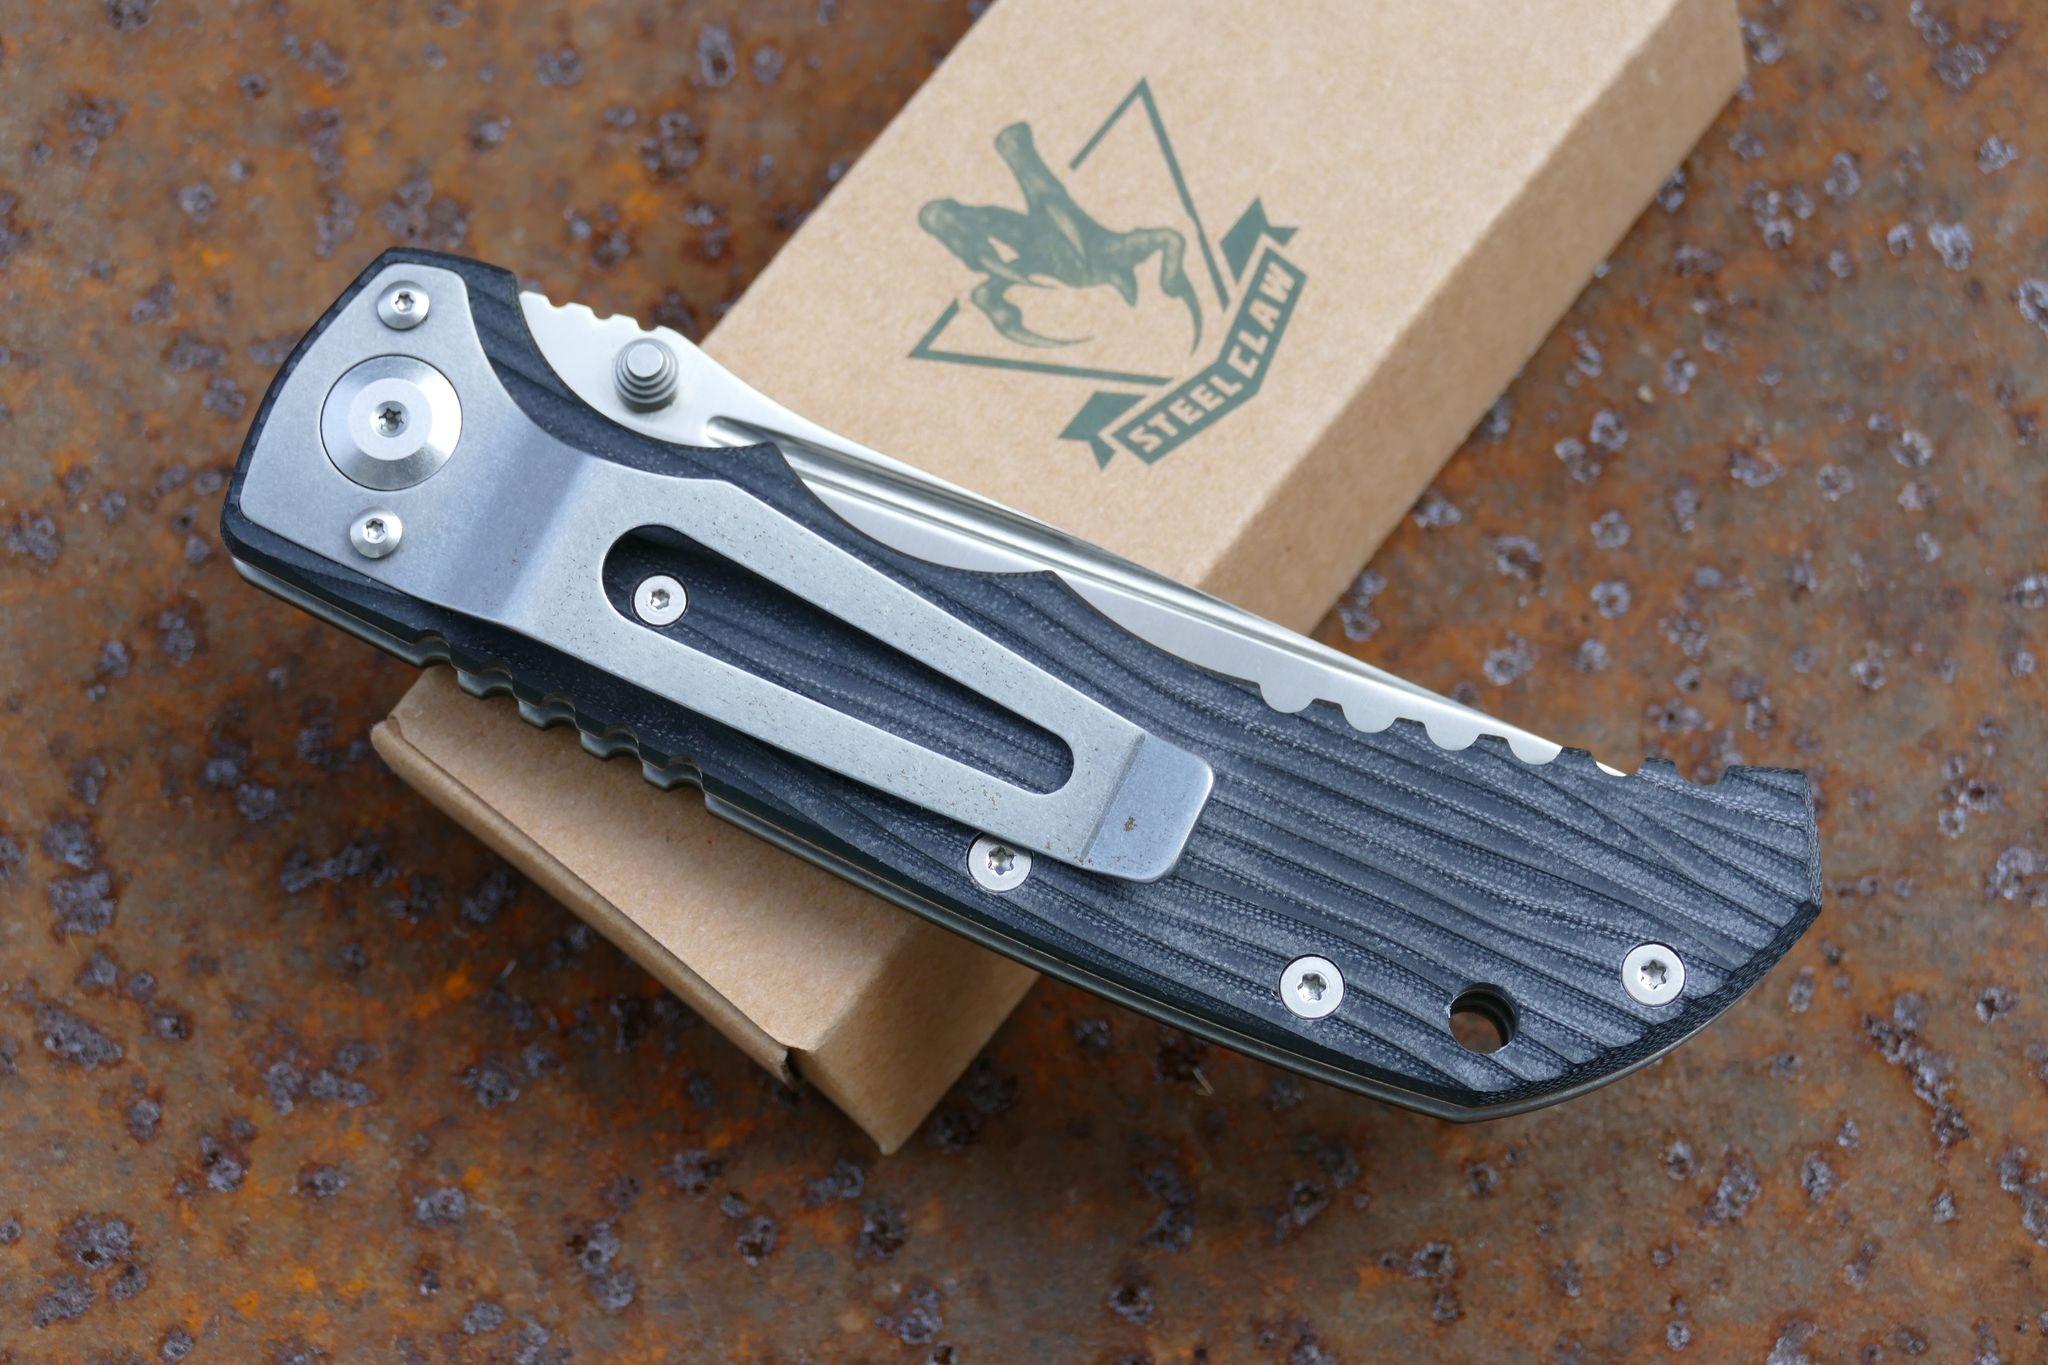 Фото 4 - Складной нож Рейнджер T6 от Steelclaw